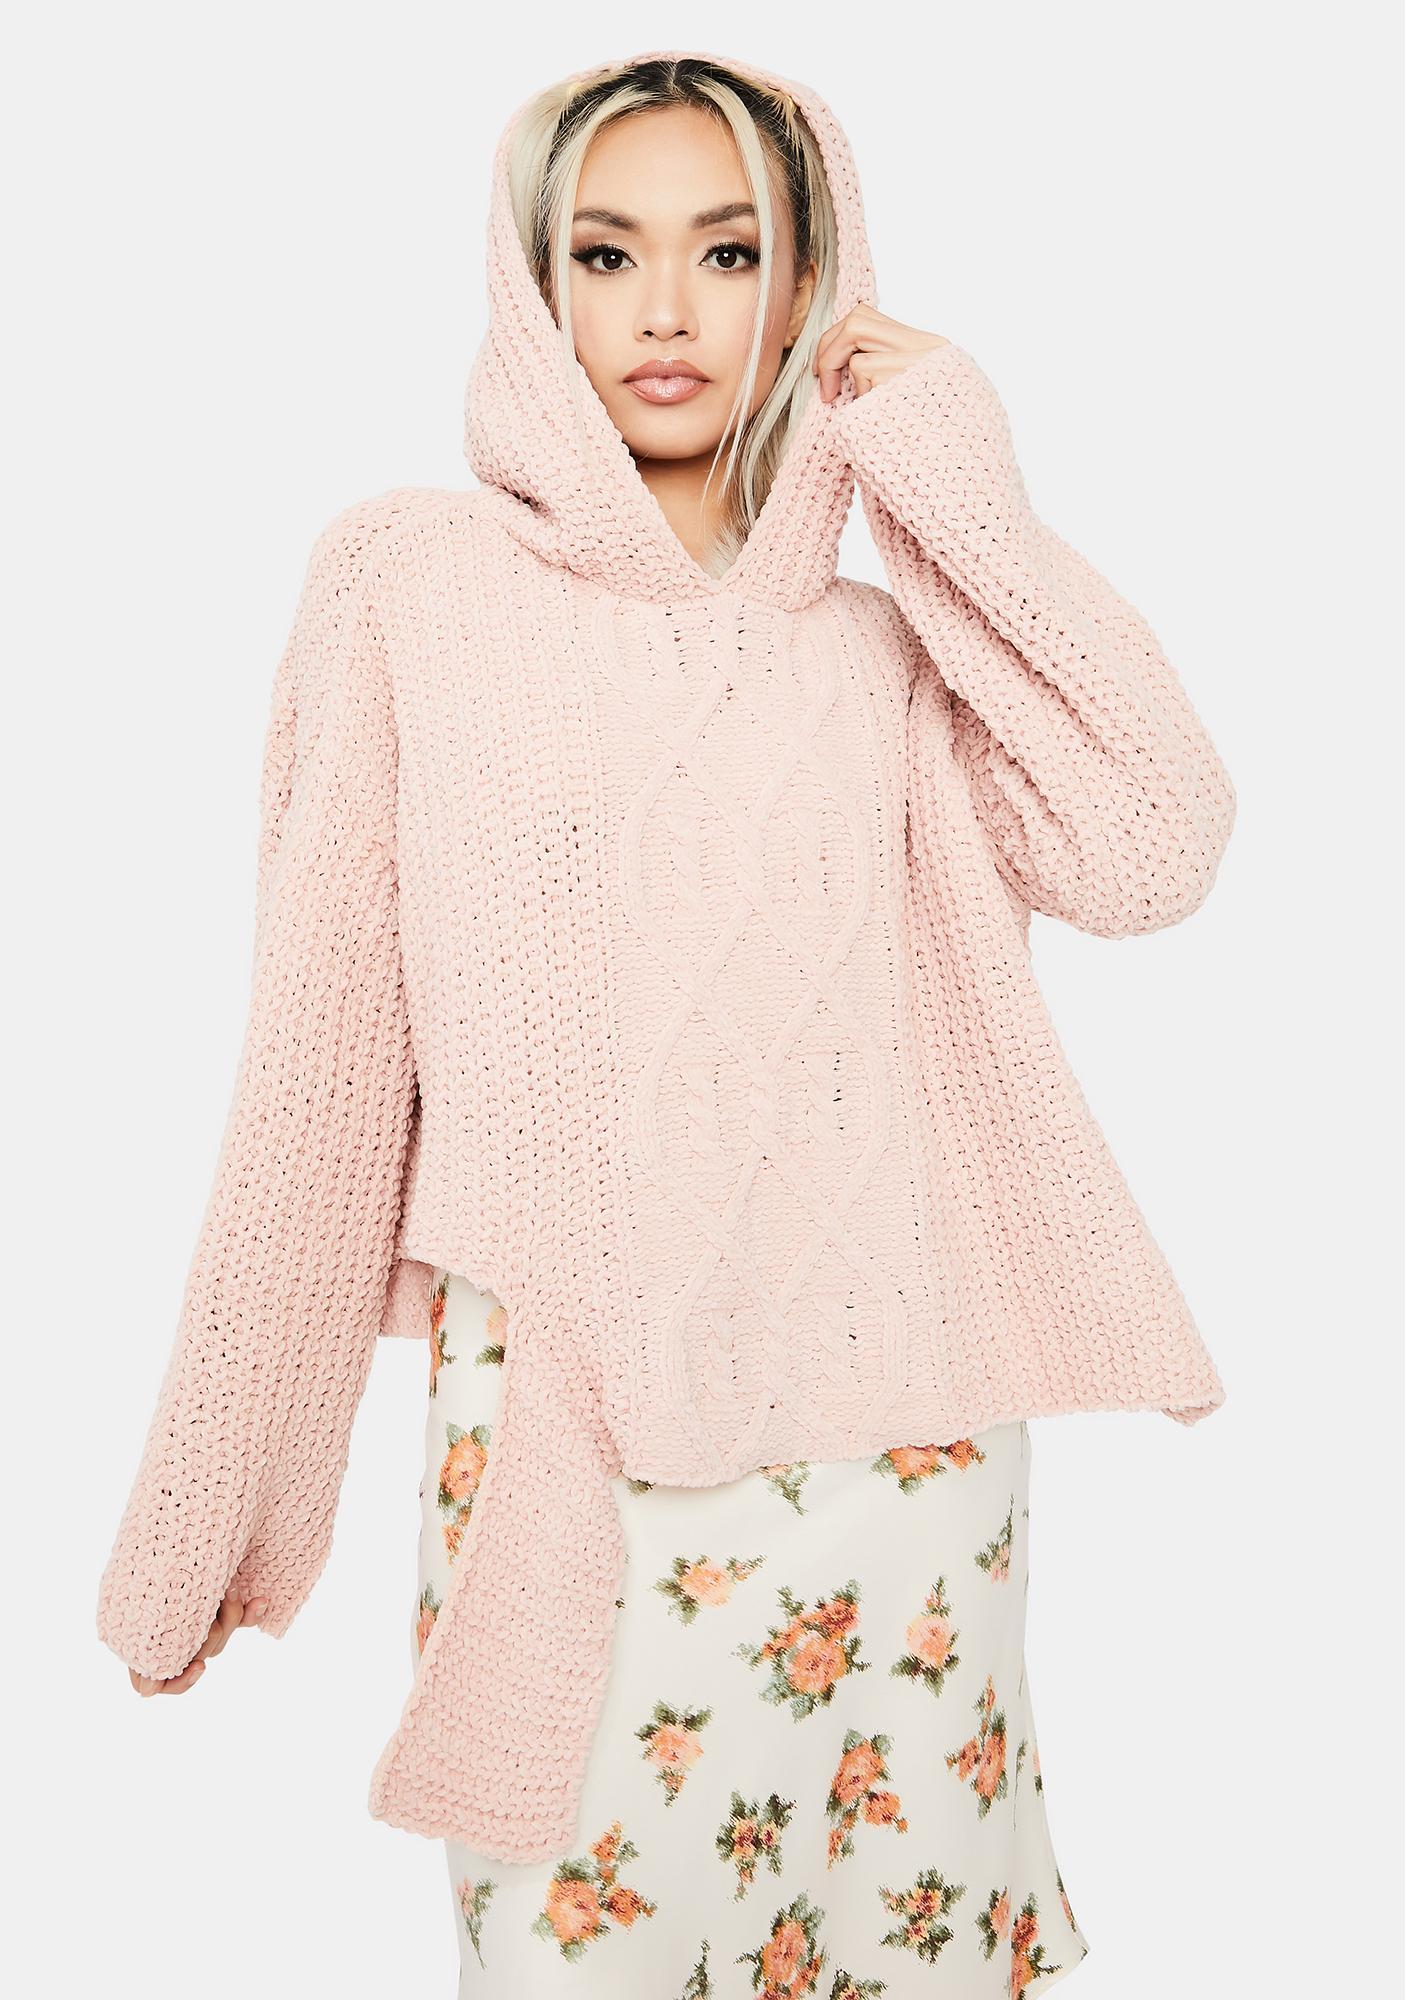 Pretty Wildest Dreams Knit Sweater